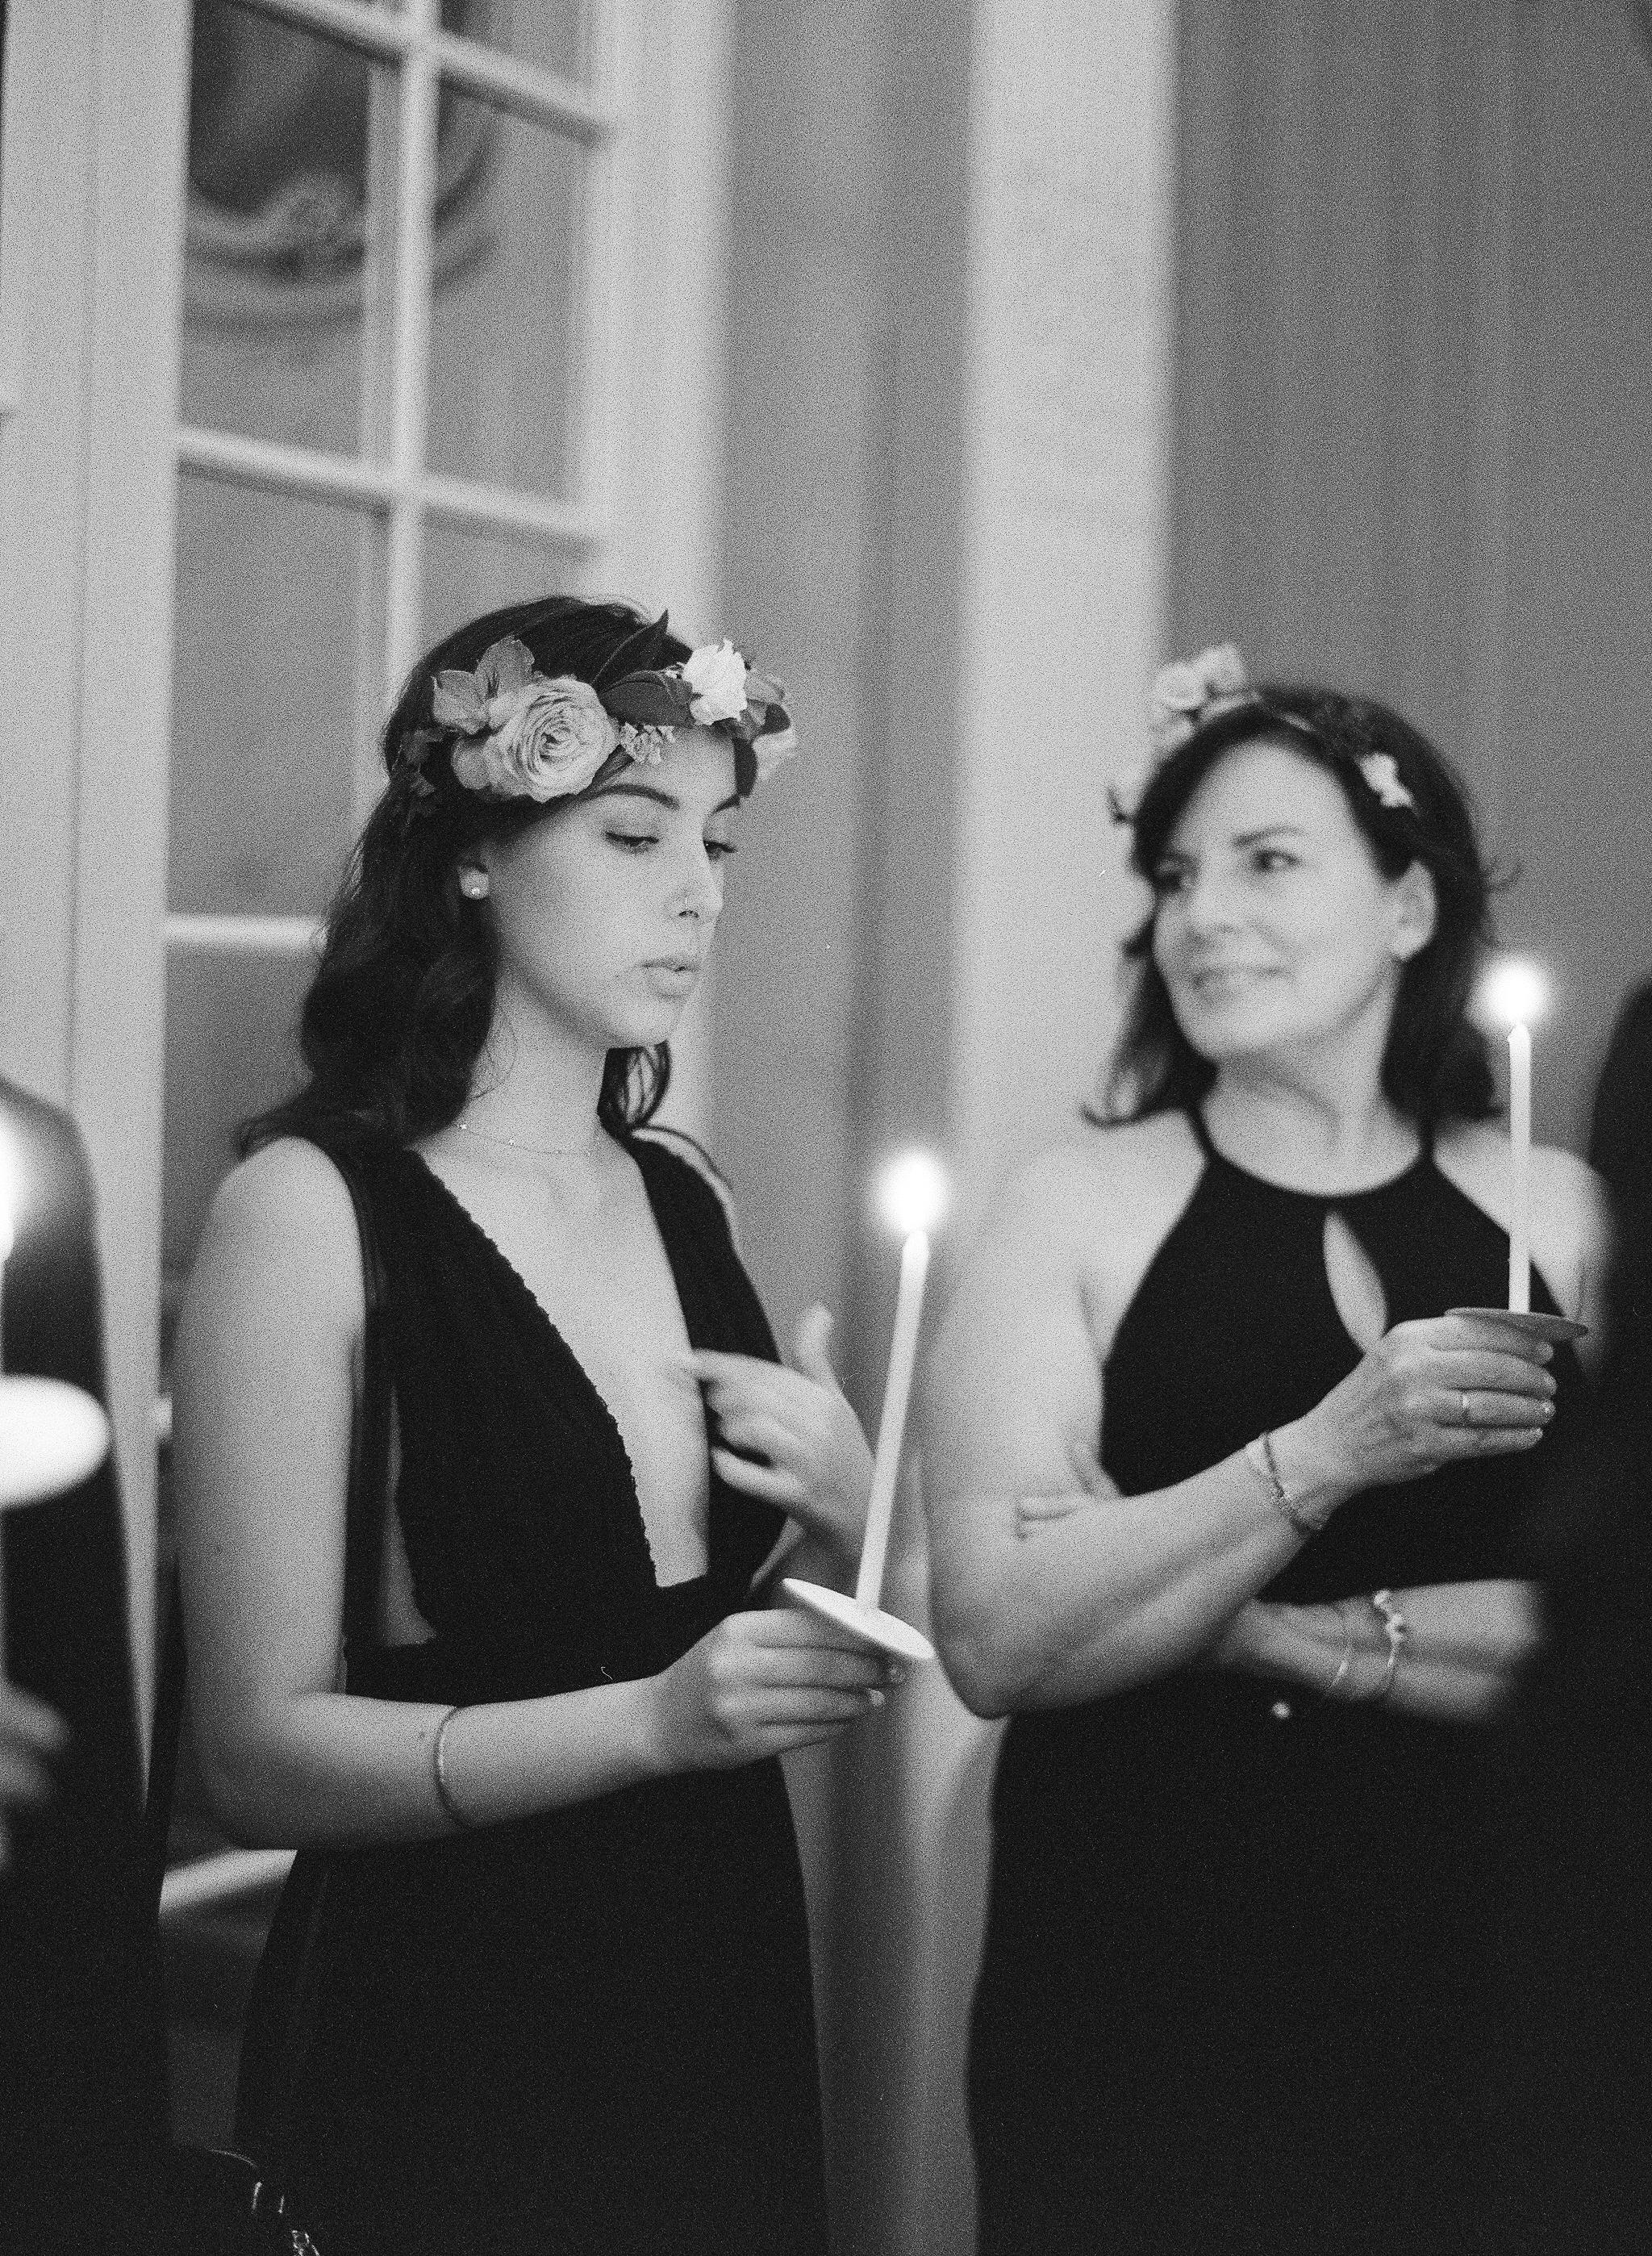 Ellen and Jeremy Wedding-Paris France-Carrie King Photographer-205.jpg